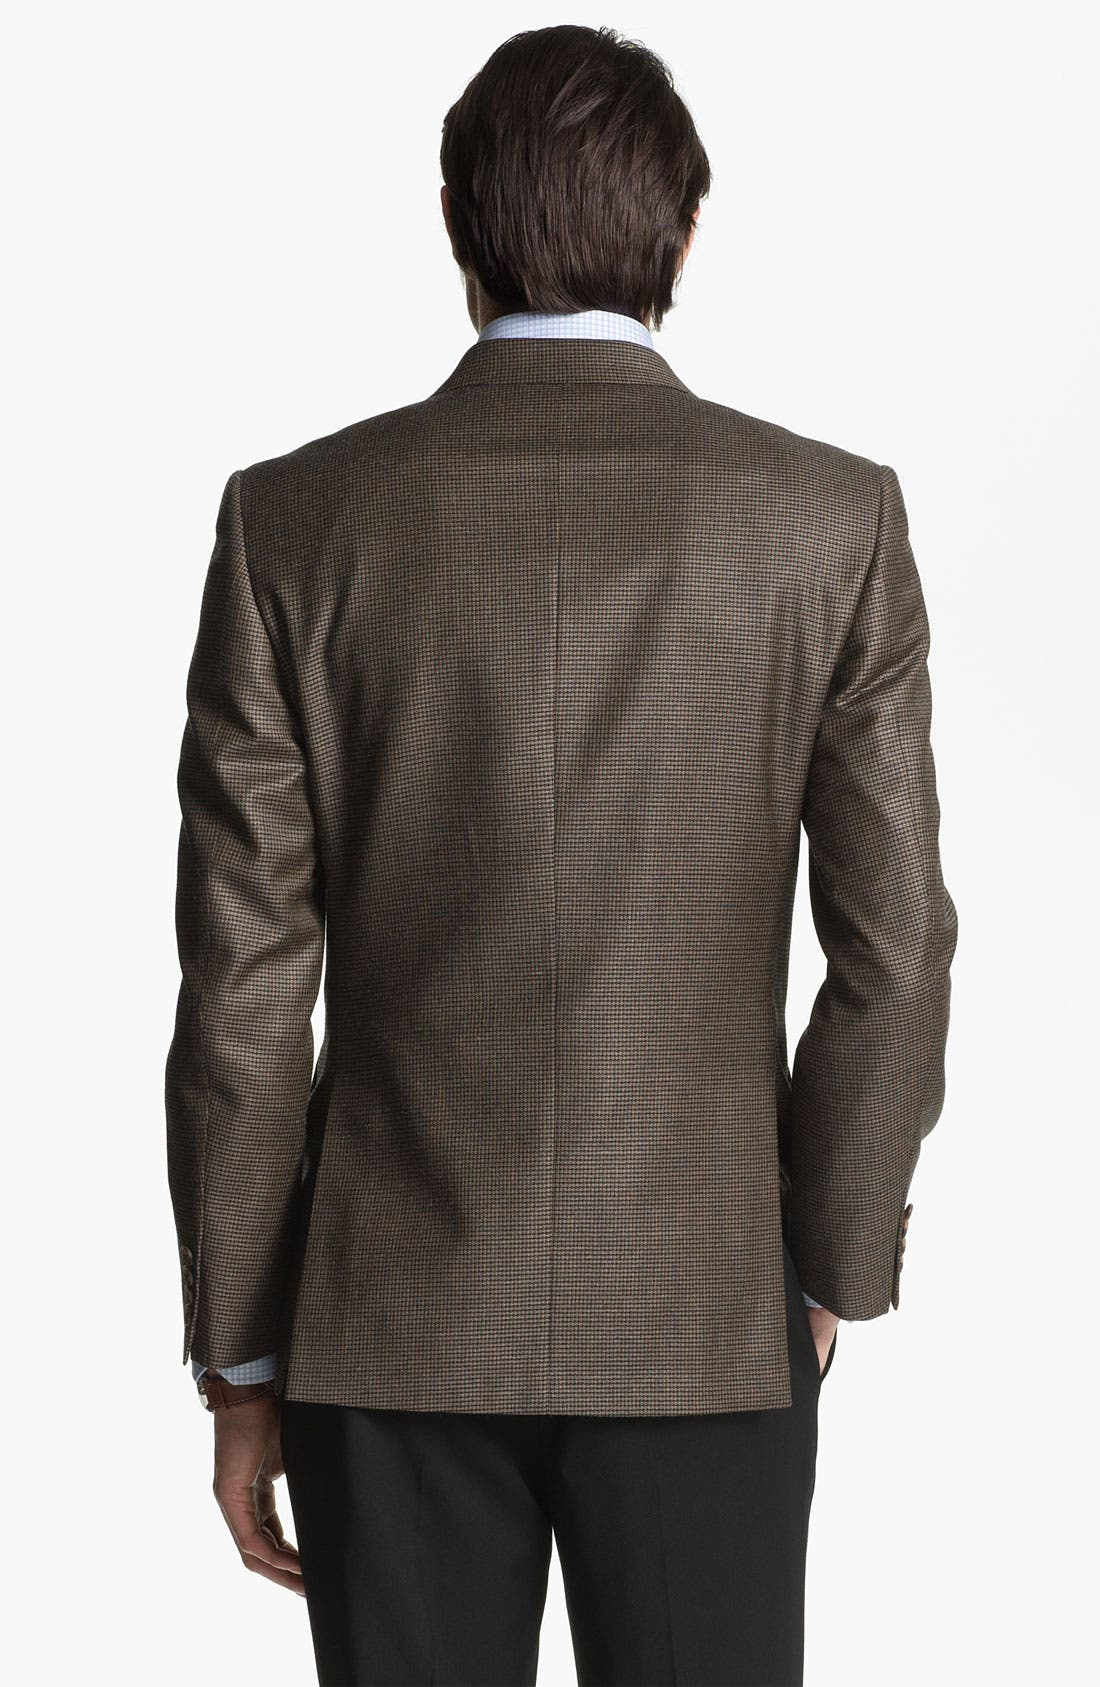 Alternate Image 2  - Joseph Abboud 'Signature Silver' Houndstooth Sportcoat